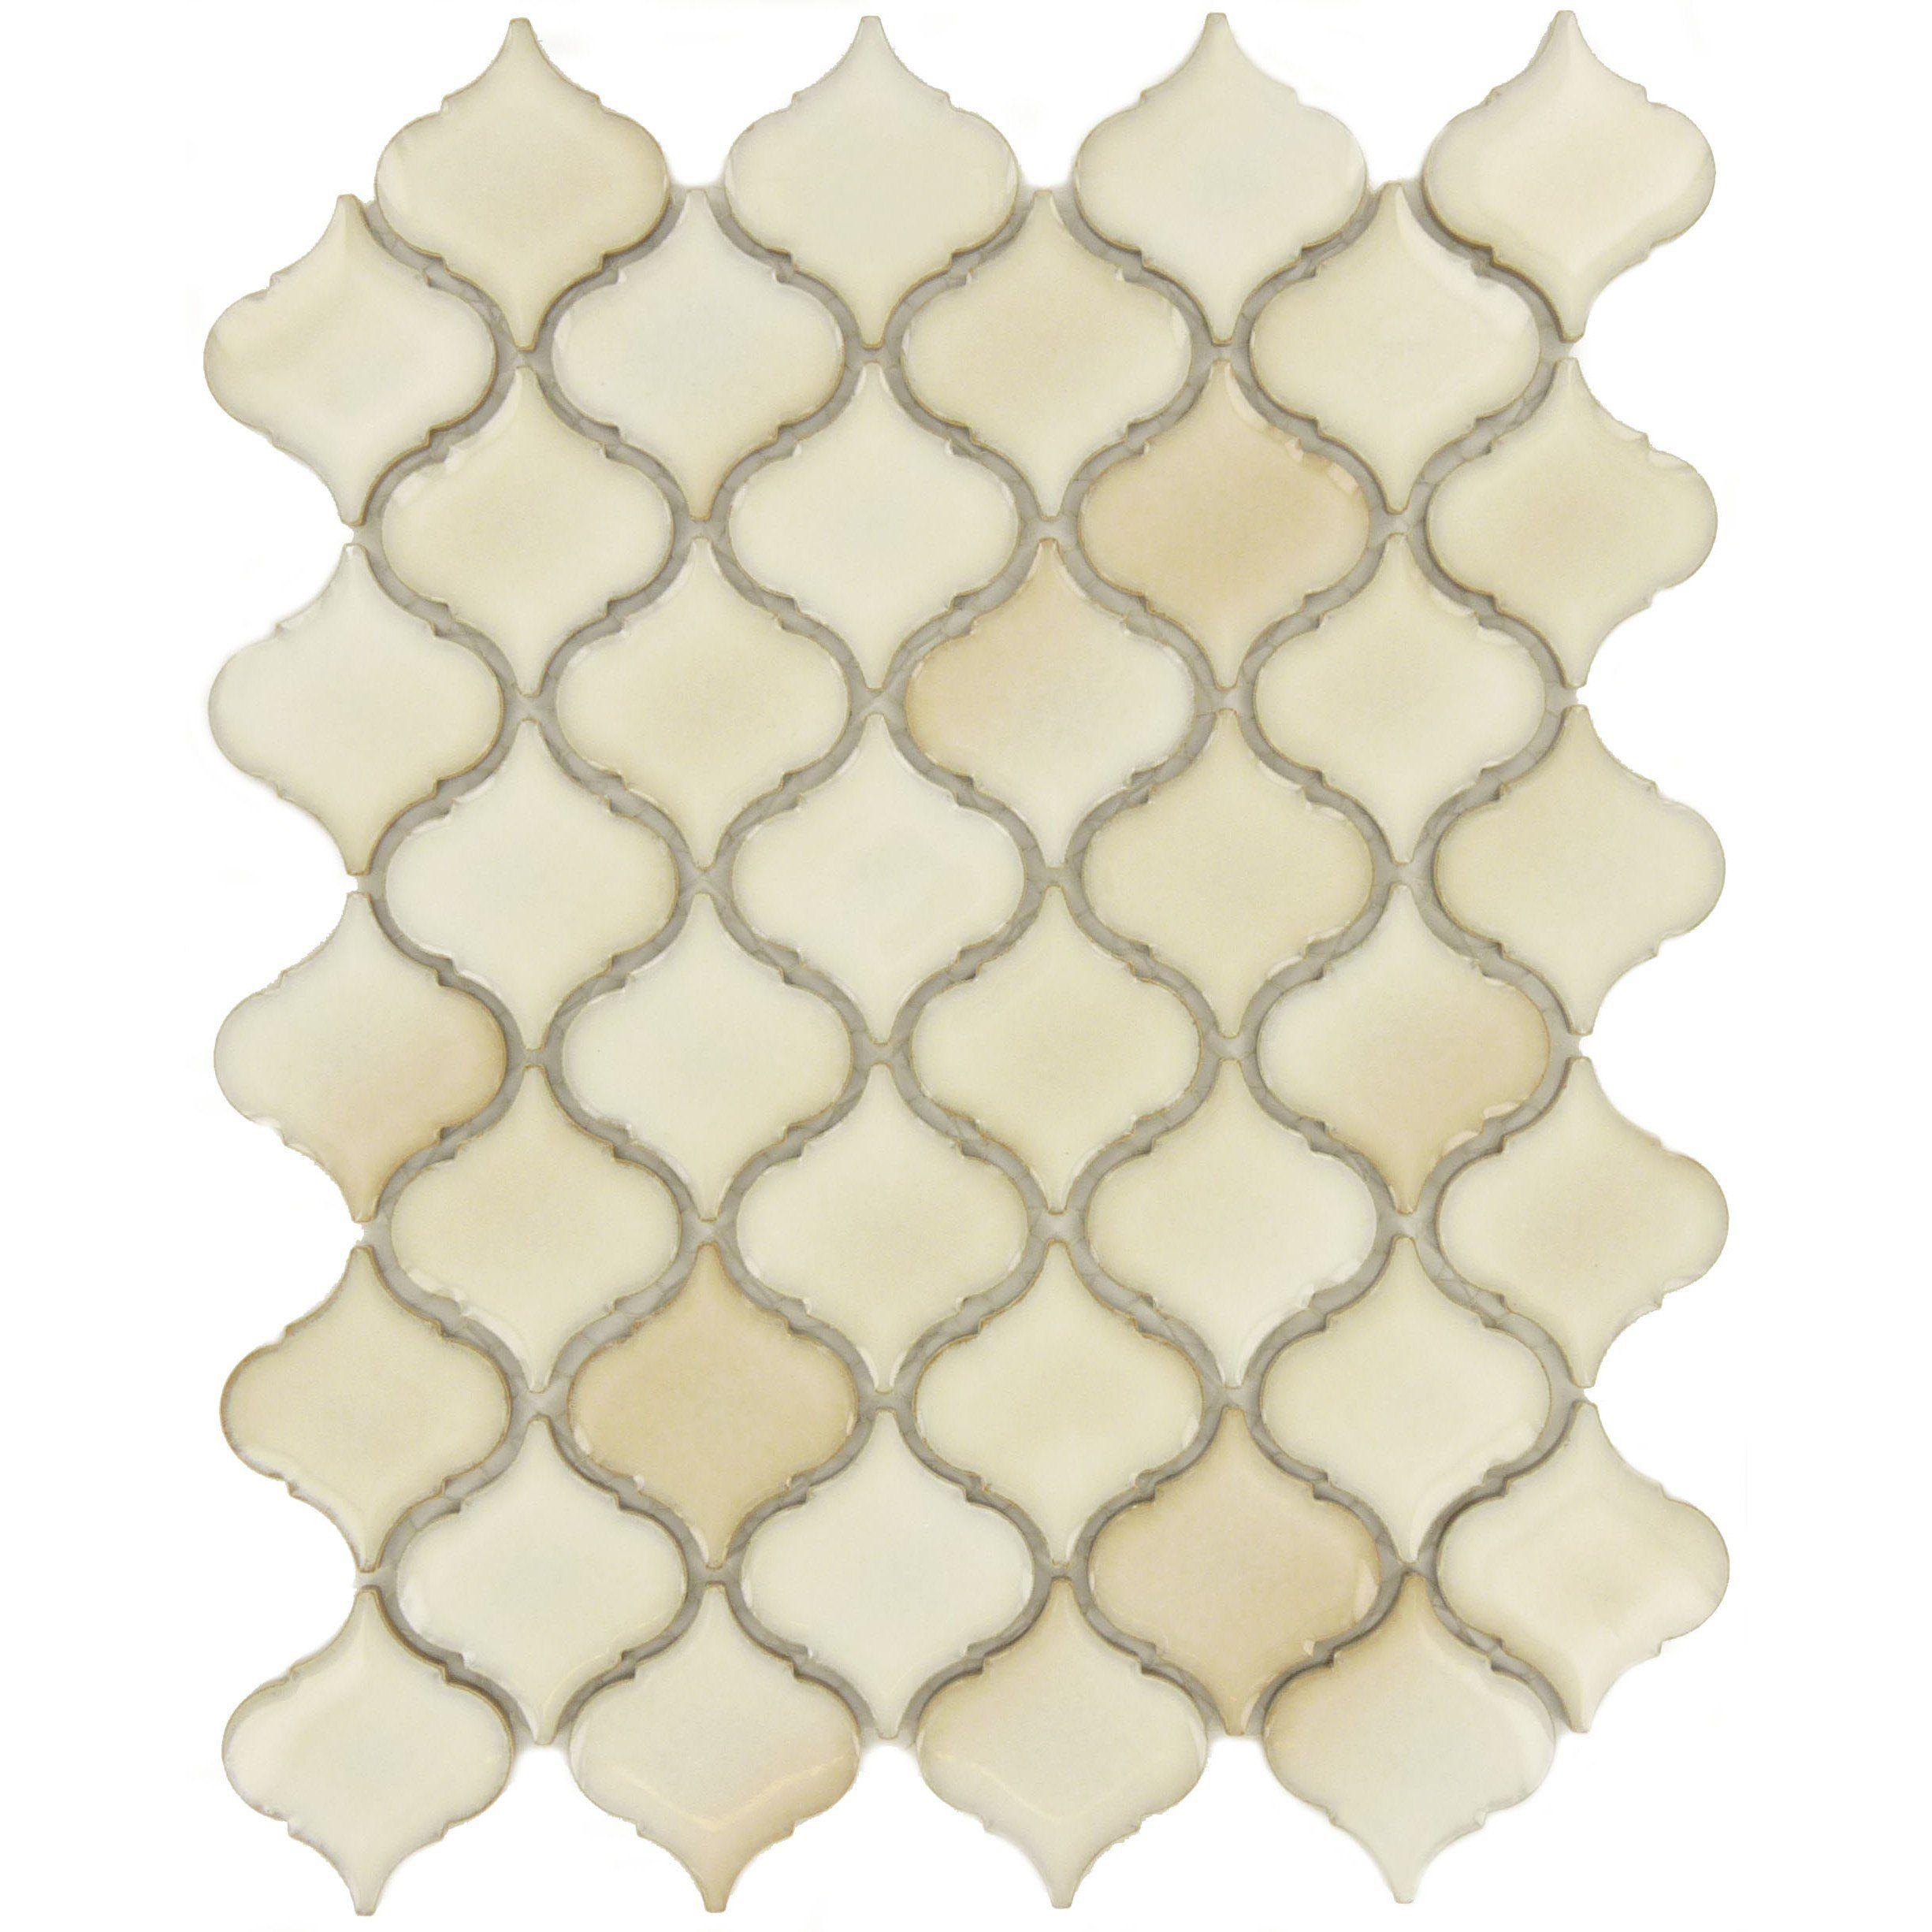 Sheet Size 10 3 8 X 12 7 8 Tile Size 2 1 8 X 2 1 2 Tiles Per Sheet 40 Tile Thickness 1 8 Arabesque Tile Arabesque Arabesque Tile Backsplash